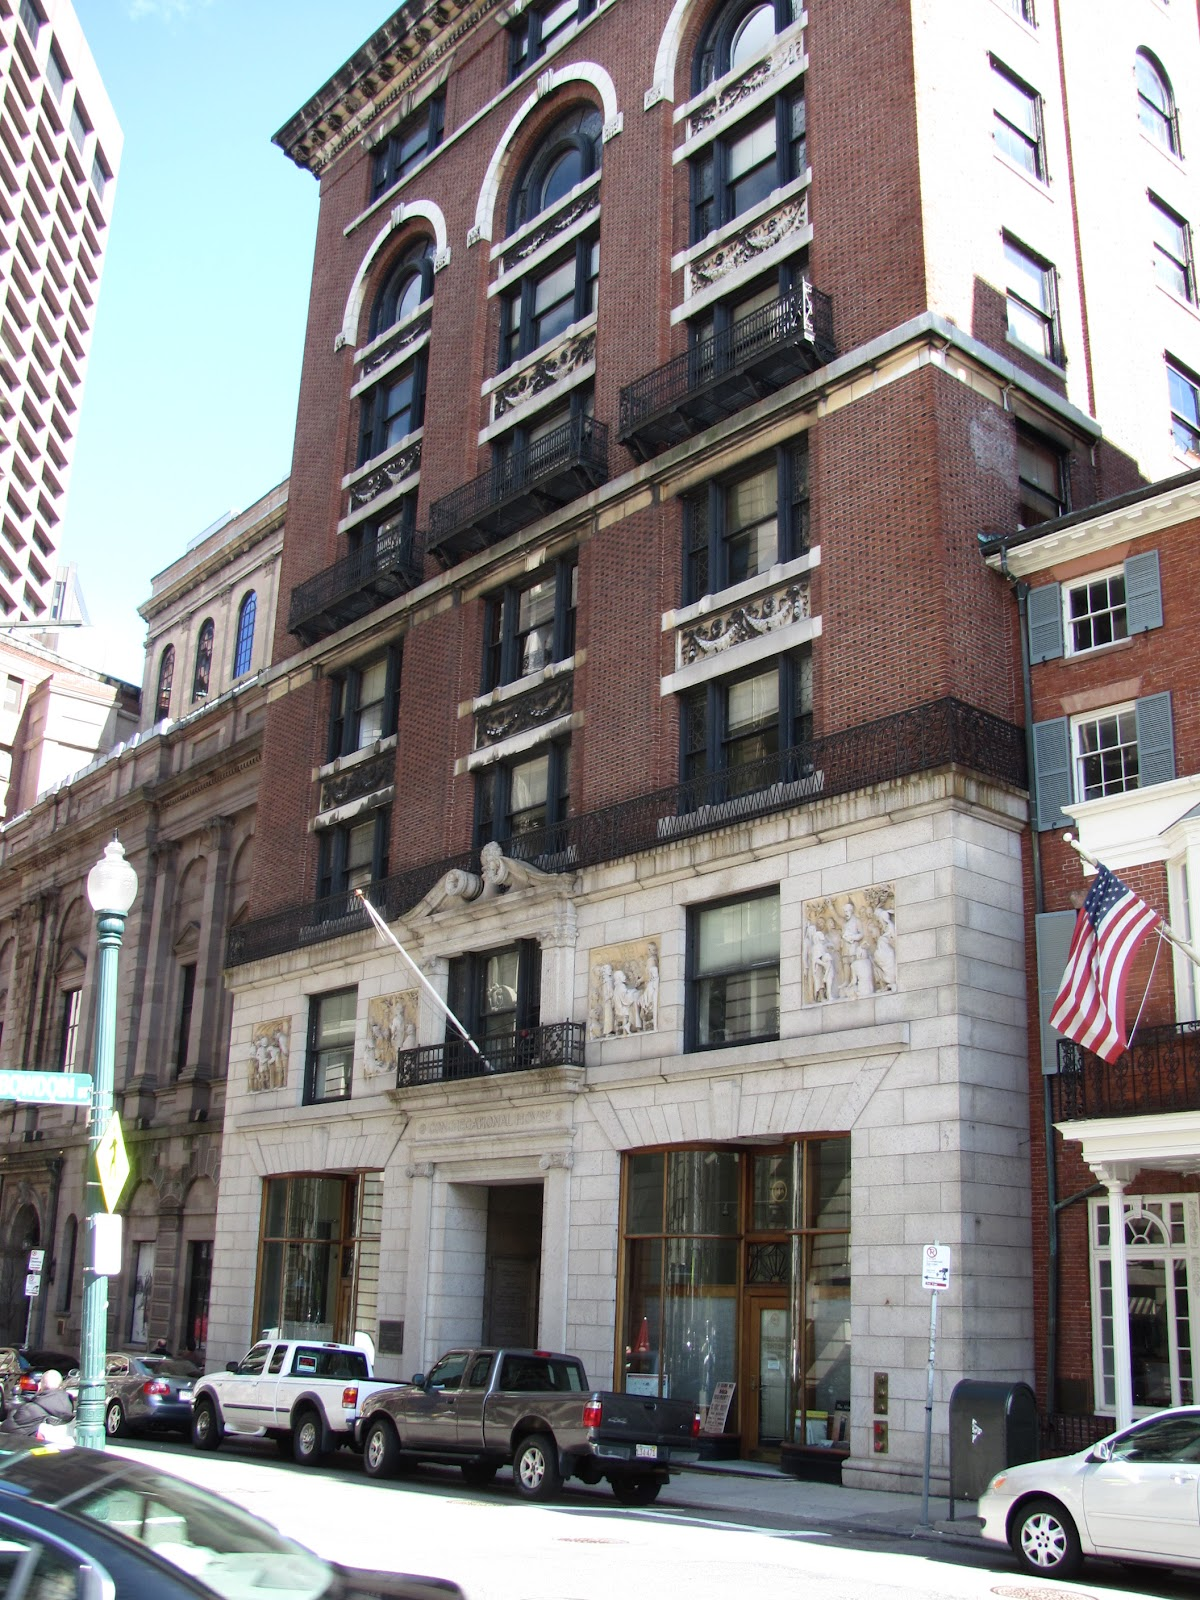 Congregational_Library%2C_Boston_MA.jpg